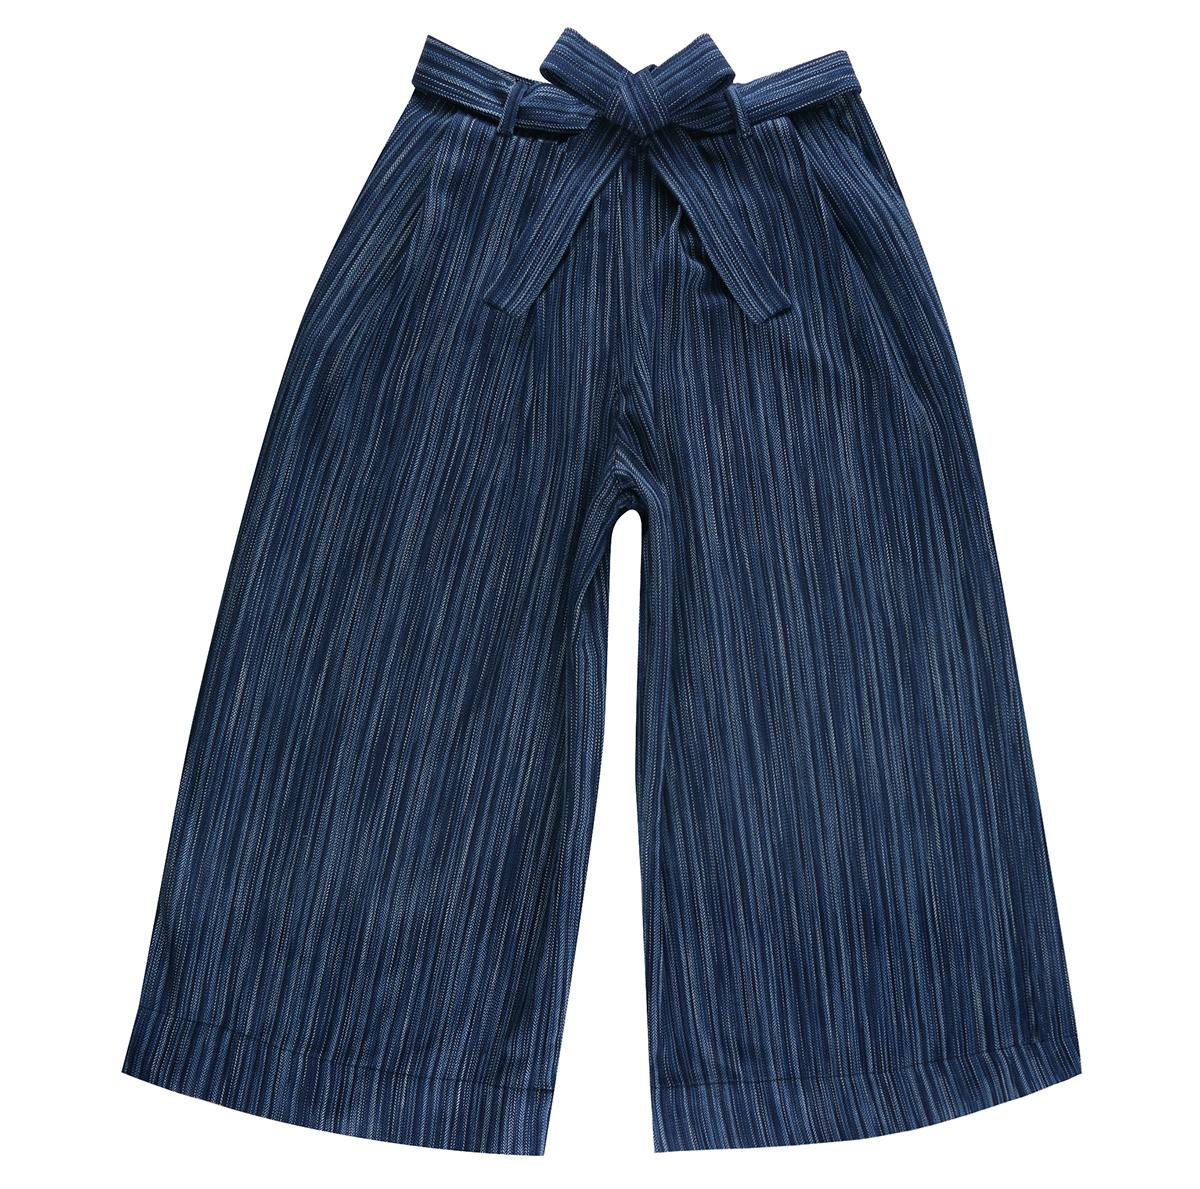 INDIGO STRIPES - Wide Pants